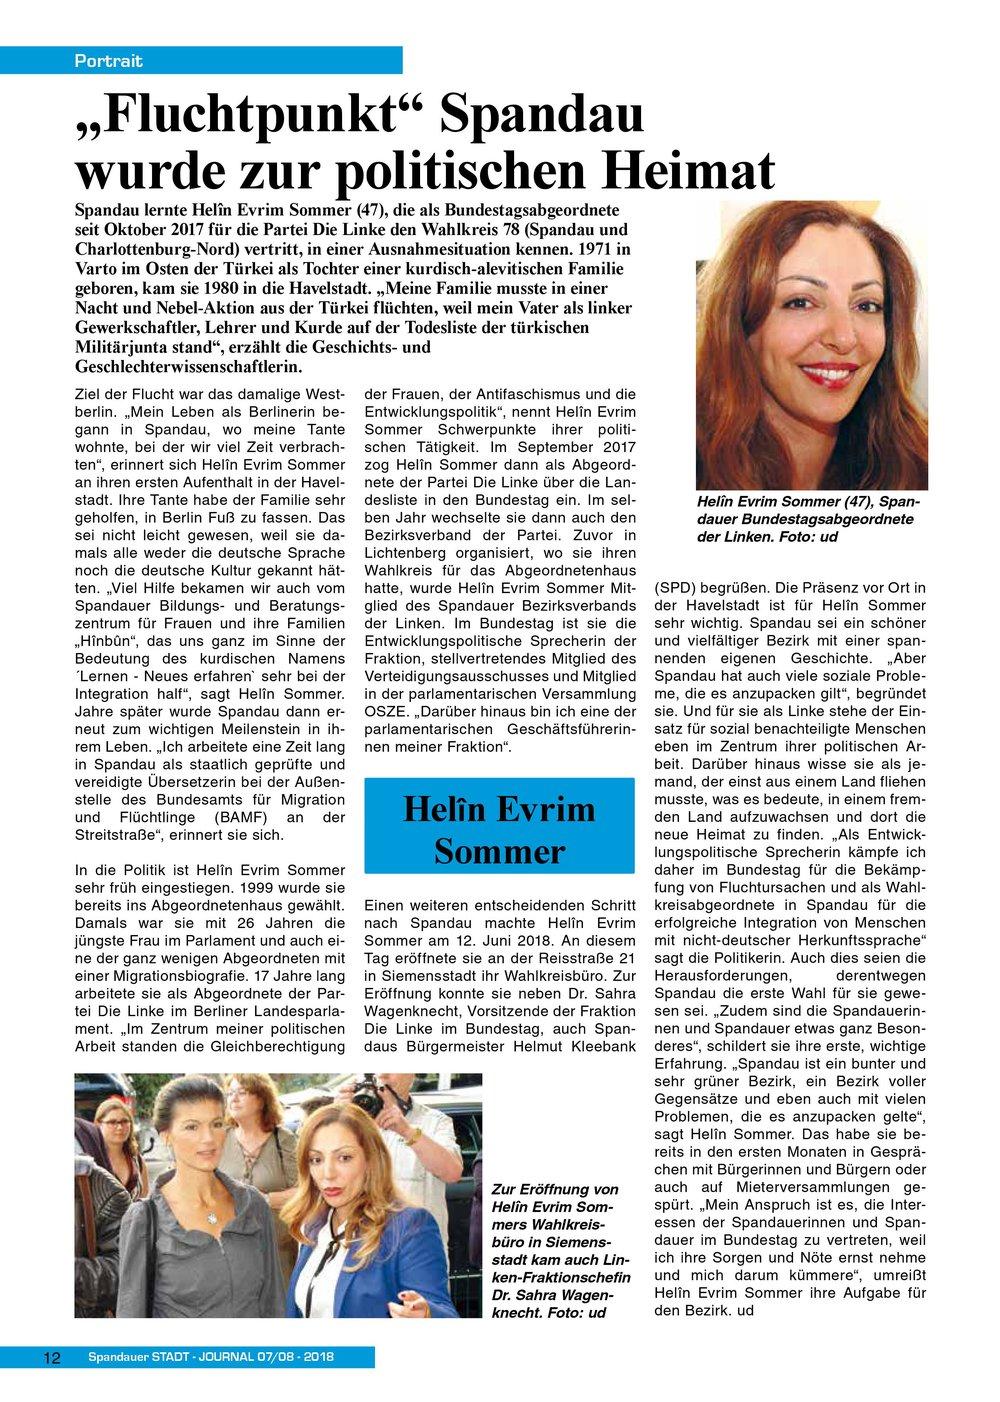 news-163-Portrait-Spandauer-Stadt-Journal.jpg